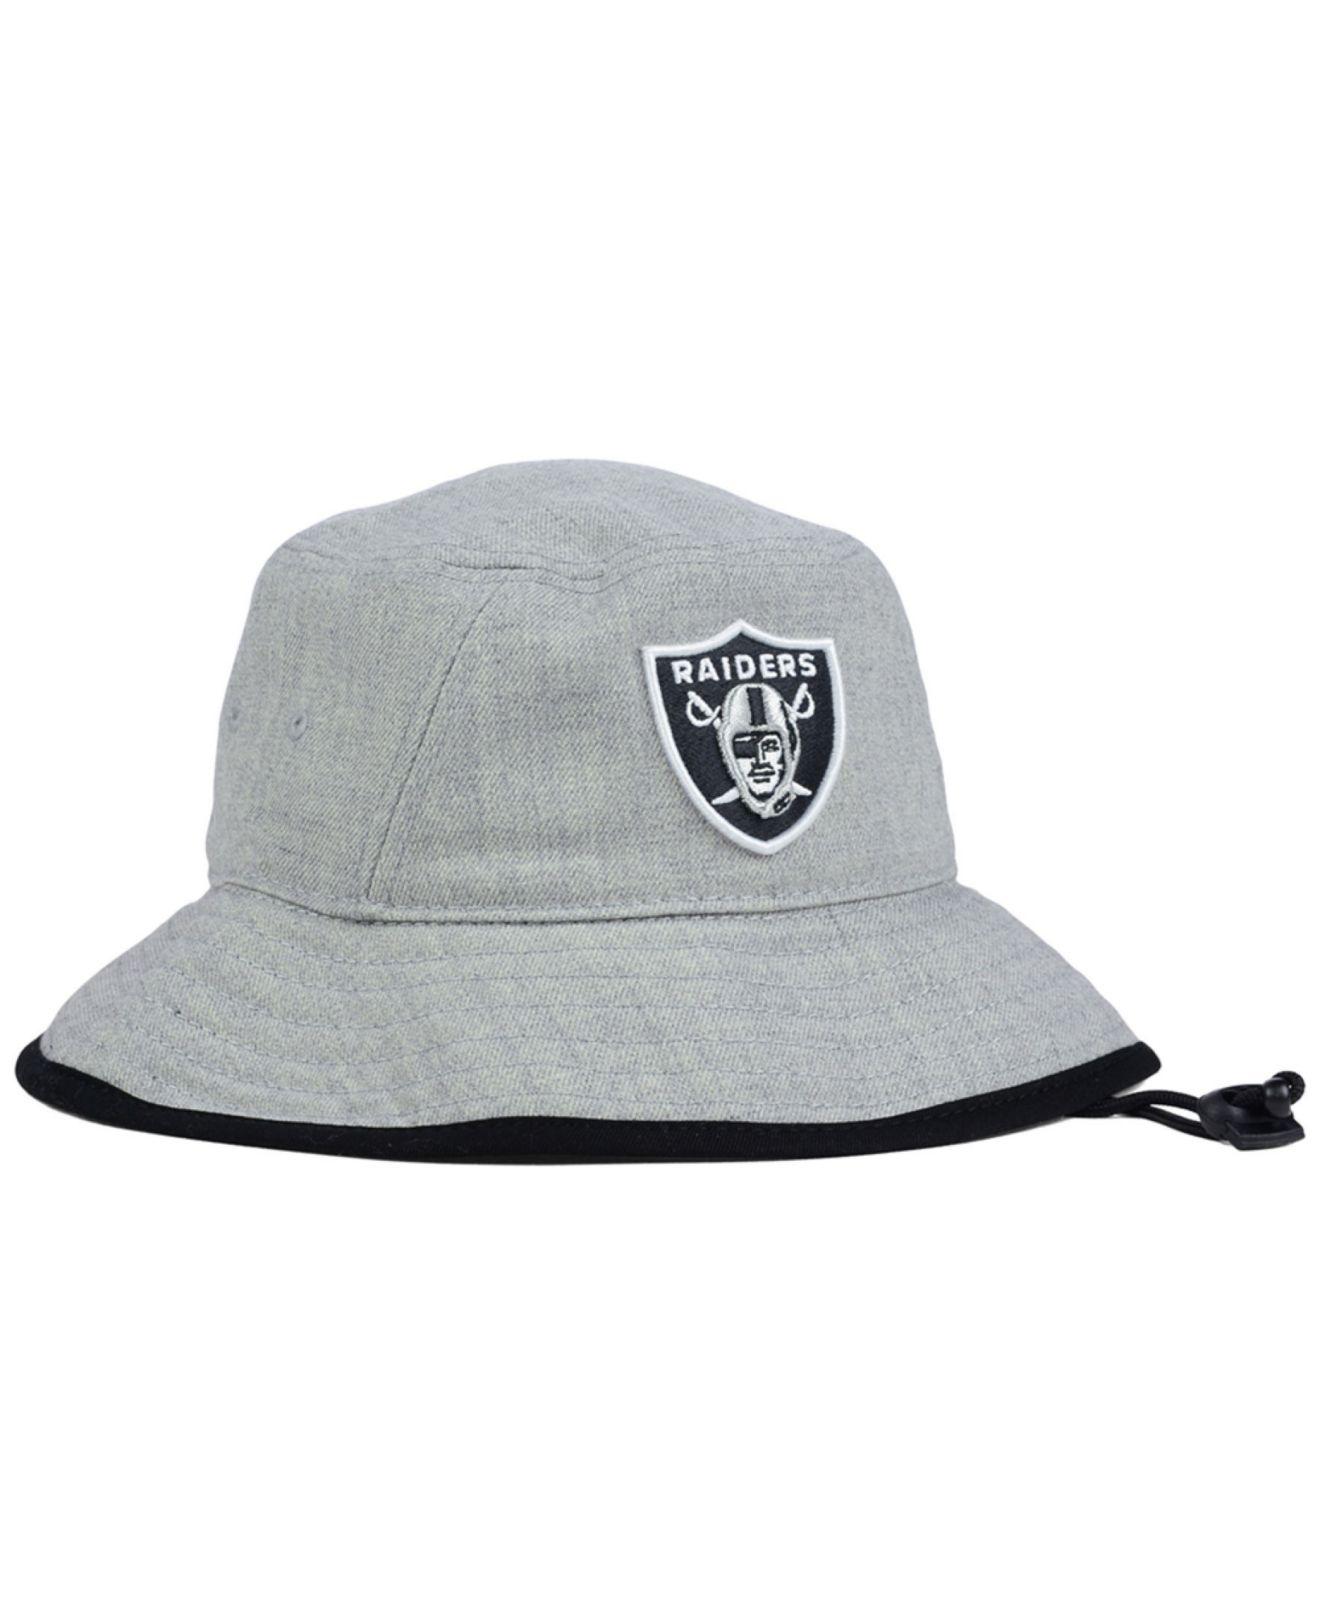 5191fbadb clearance new era nfl bucket hats 10ef4 0f9b1